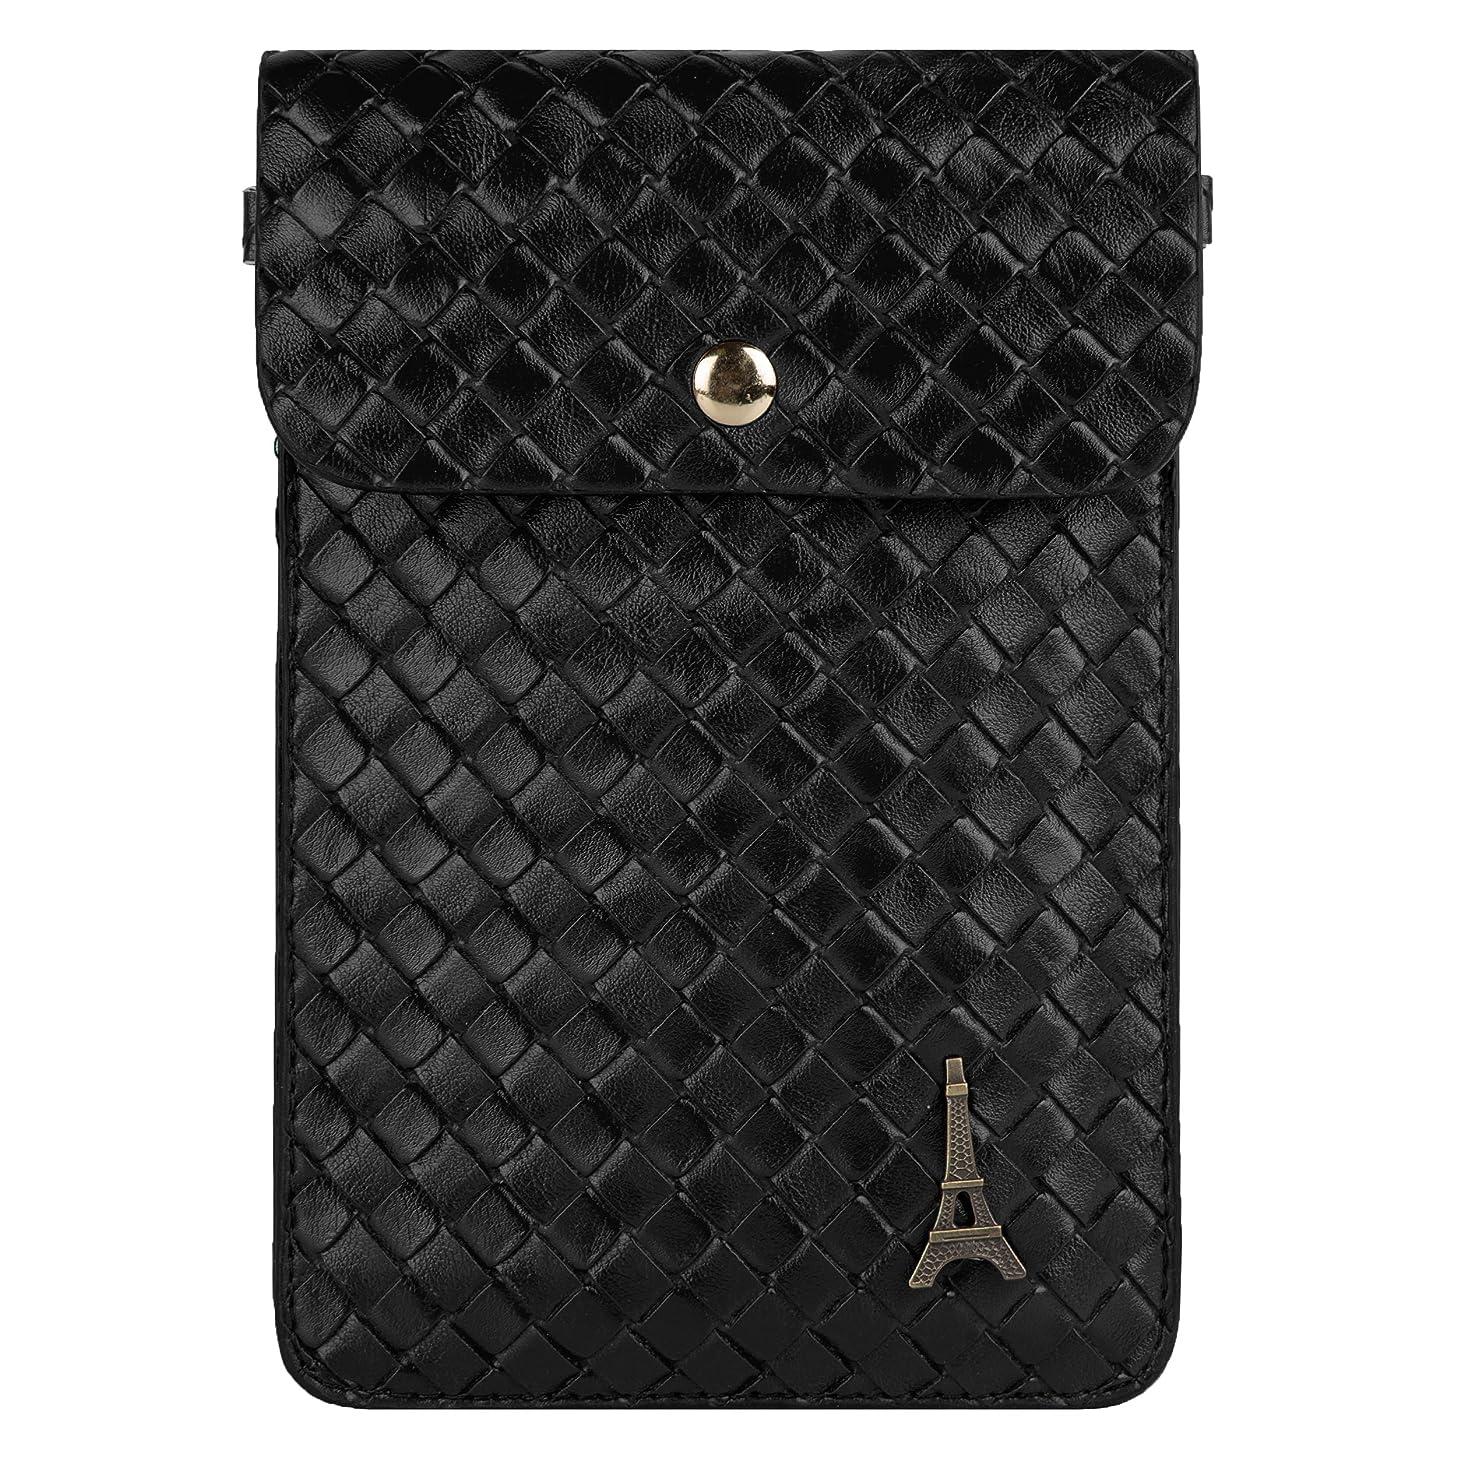 VanGoddy Braided PU Leather Pouch Case for BLU Neo 4.5 / Neo 3.5 / Vivo 4.8 HD Unlocked Phones (Black)